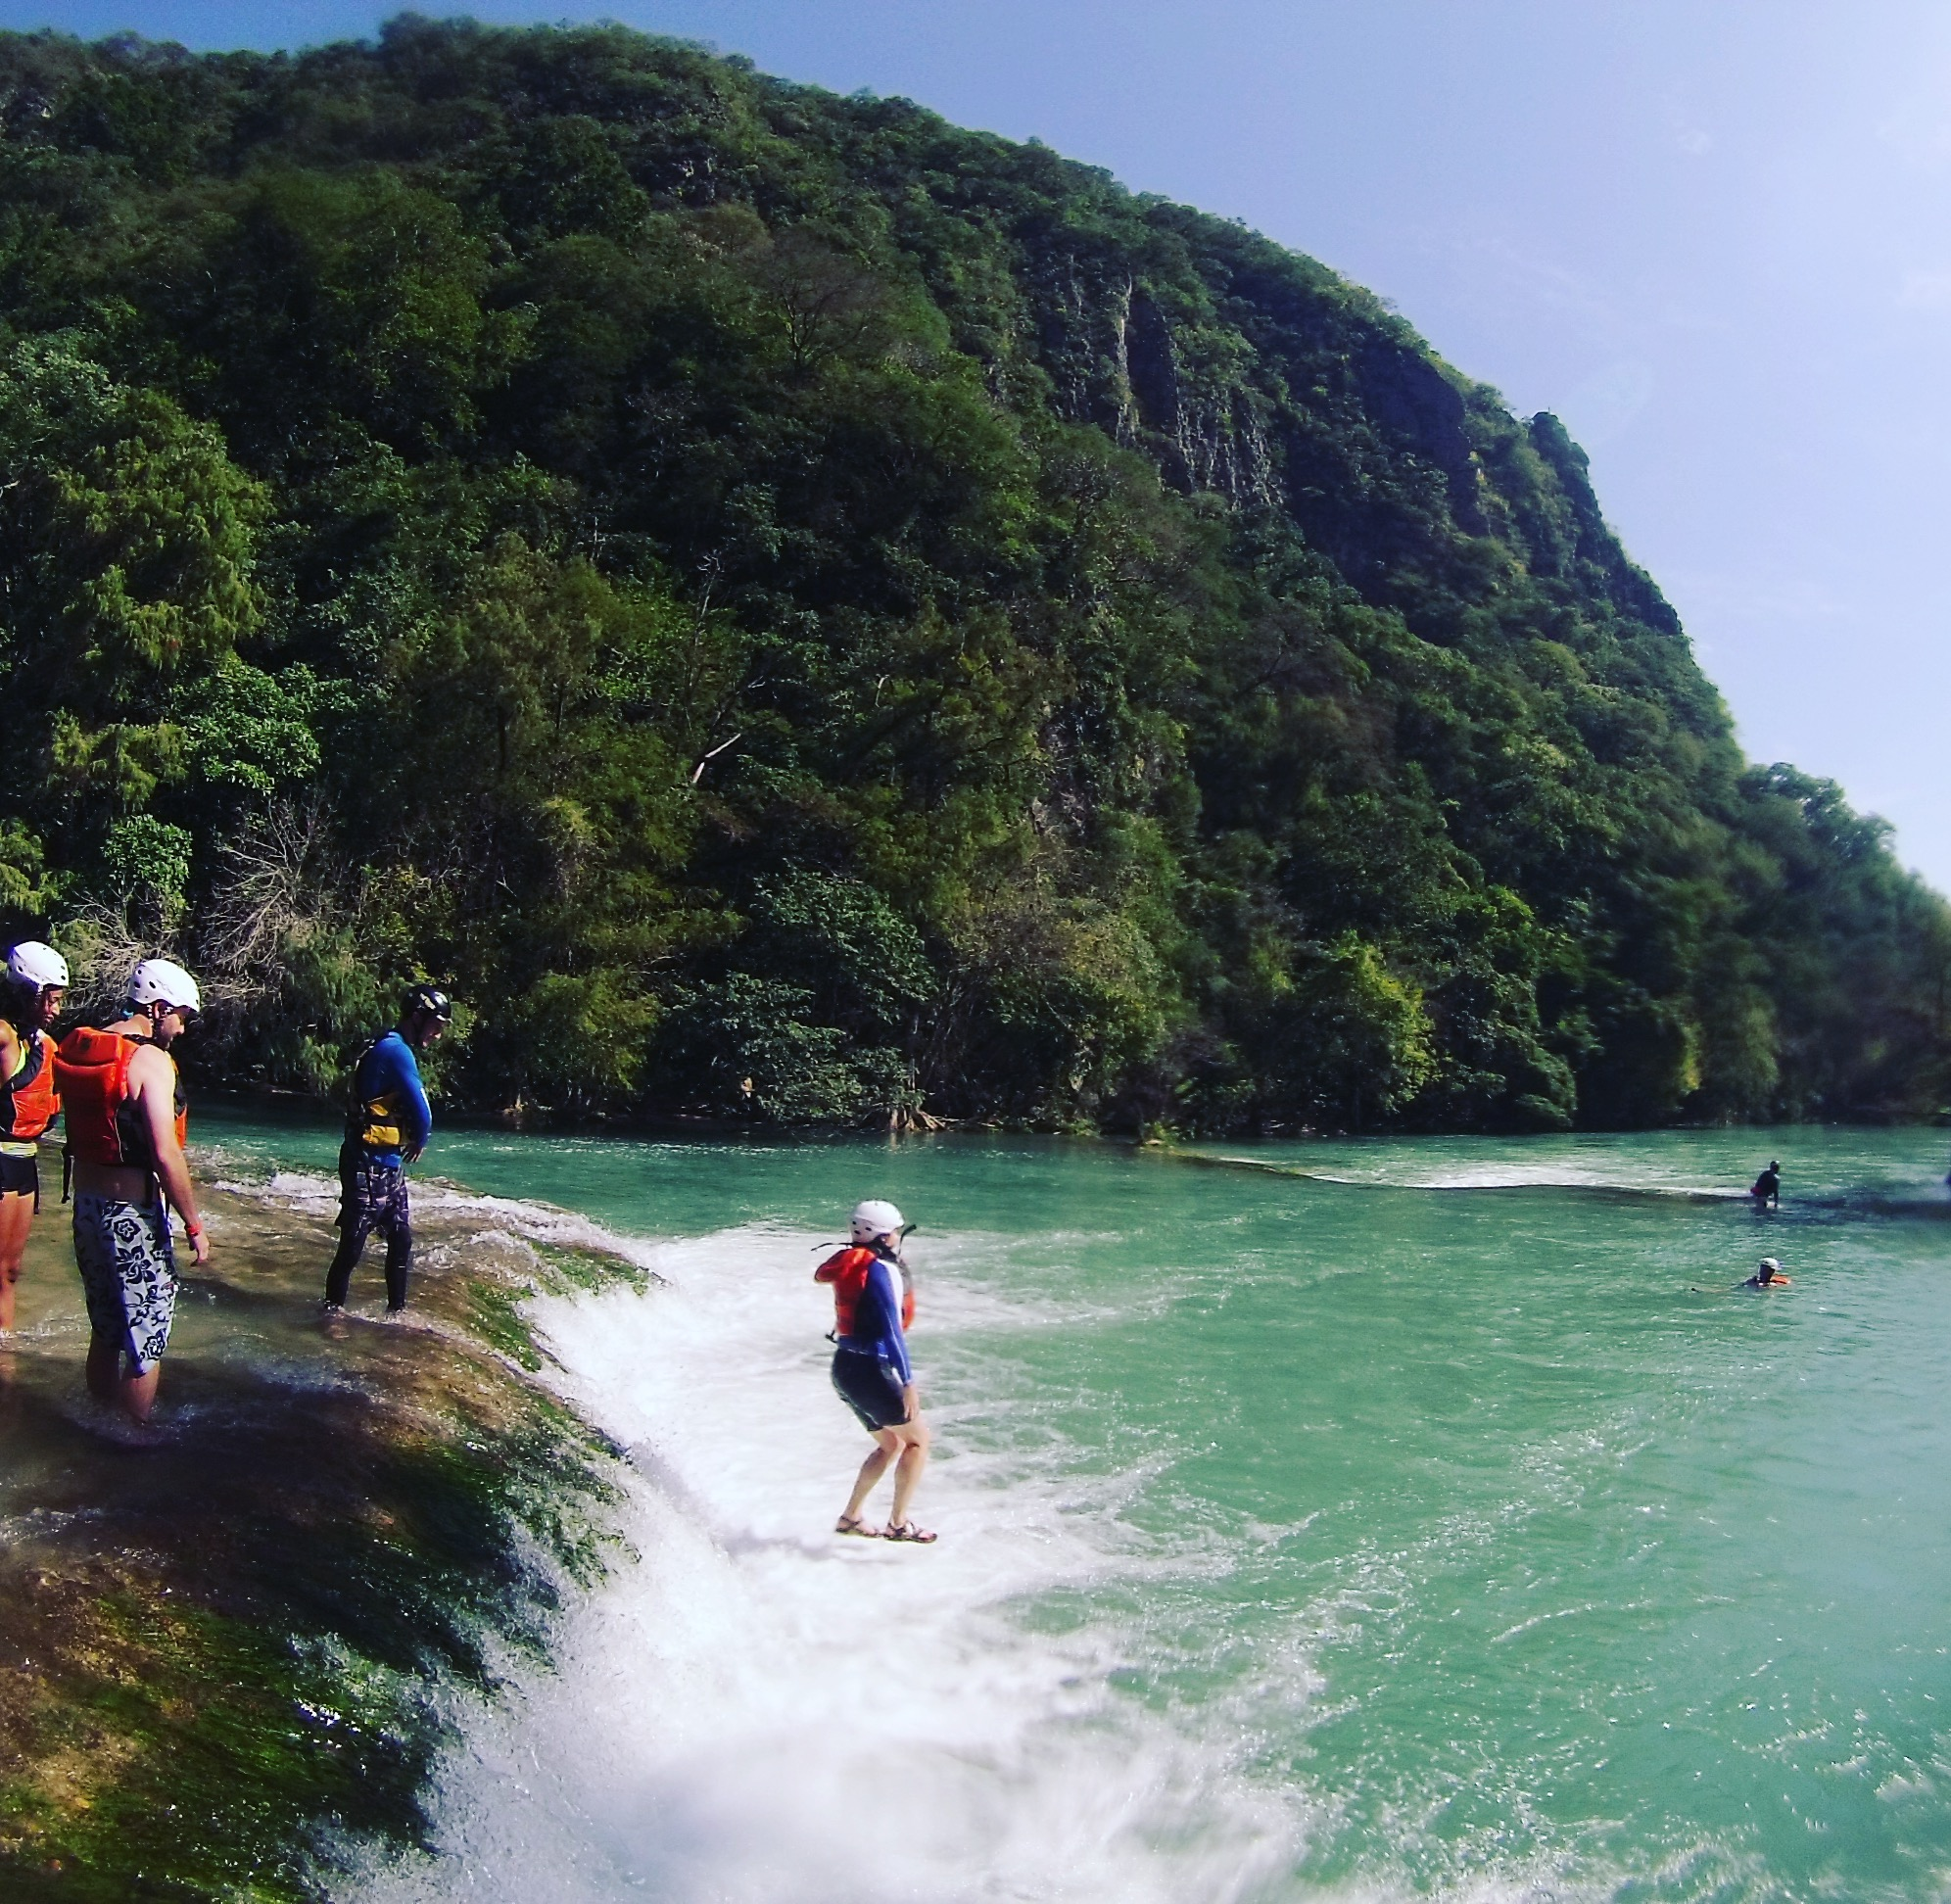 Mexico Outbound Tour Operators